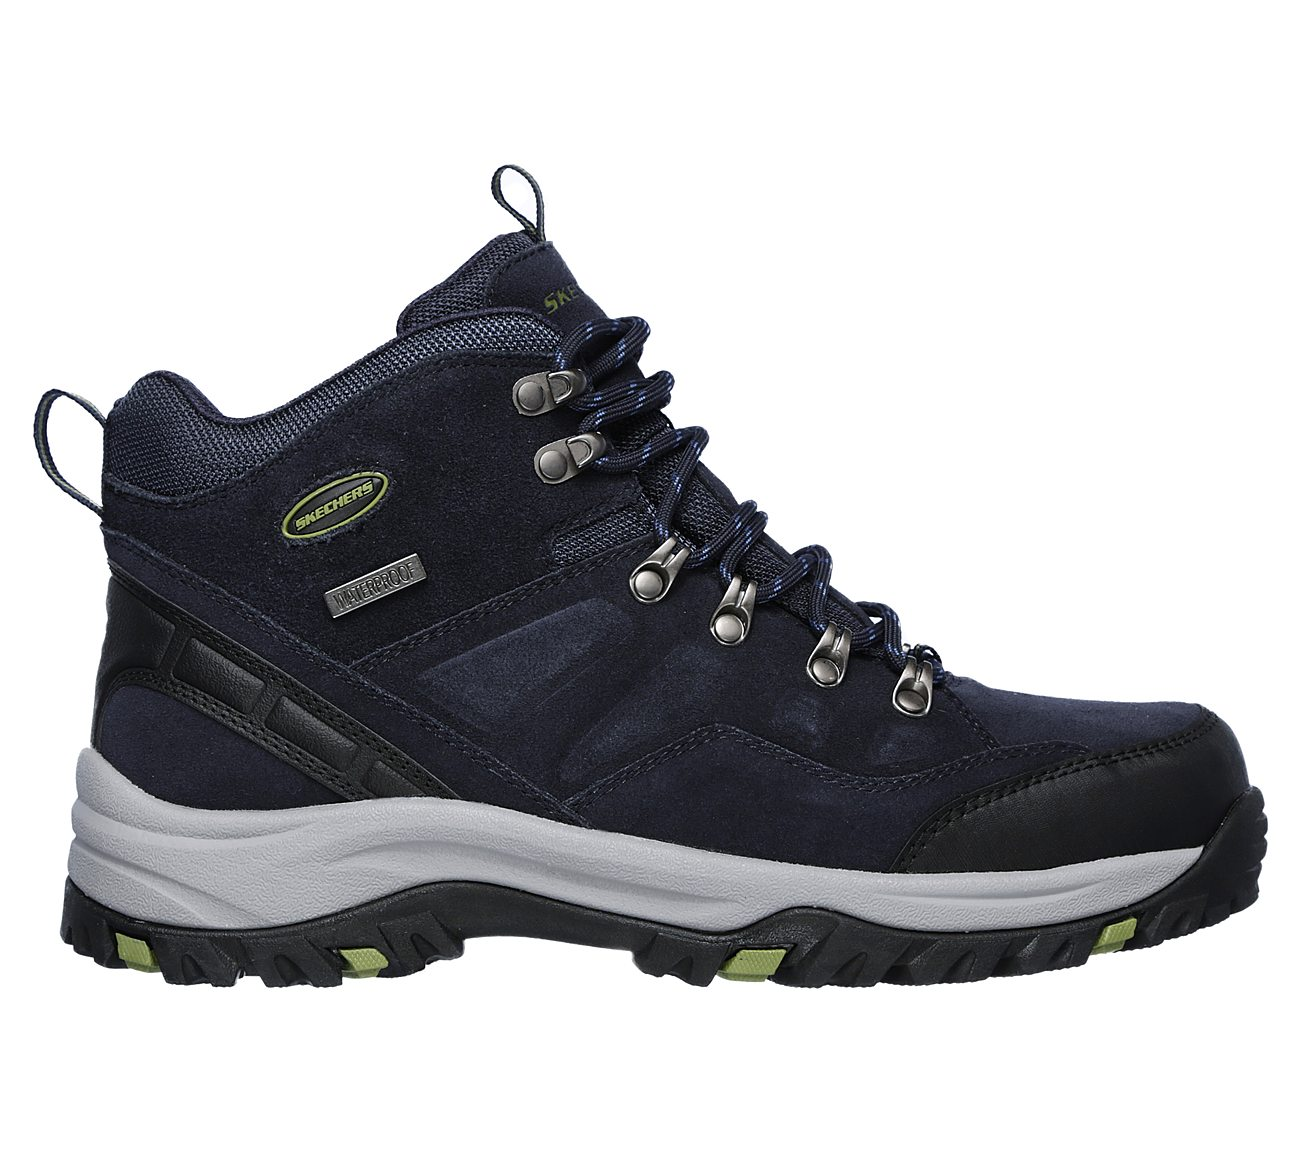 Skechers Relment Pelmo 64869 NVY Navy boots